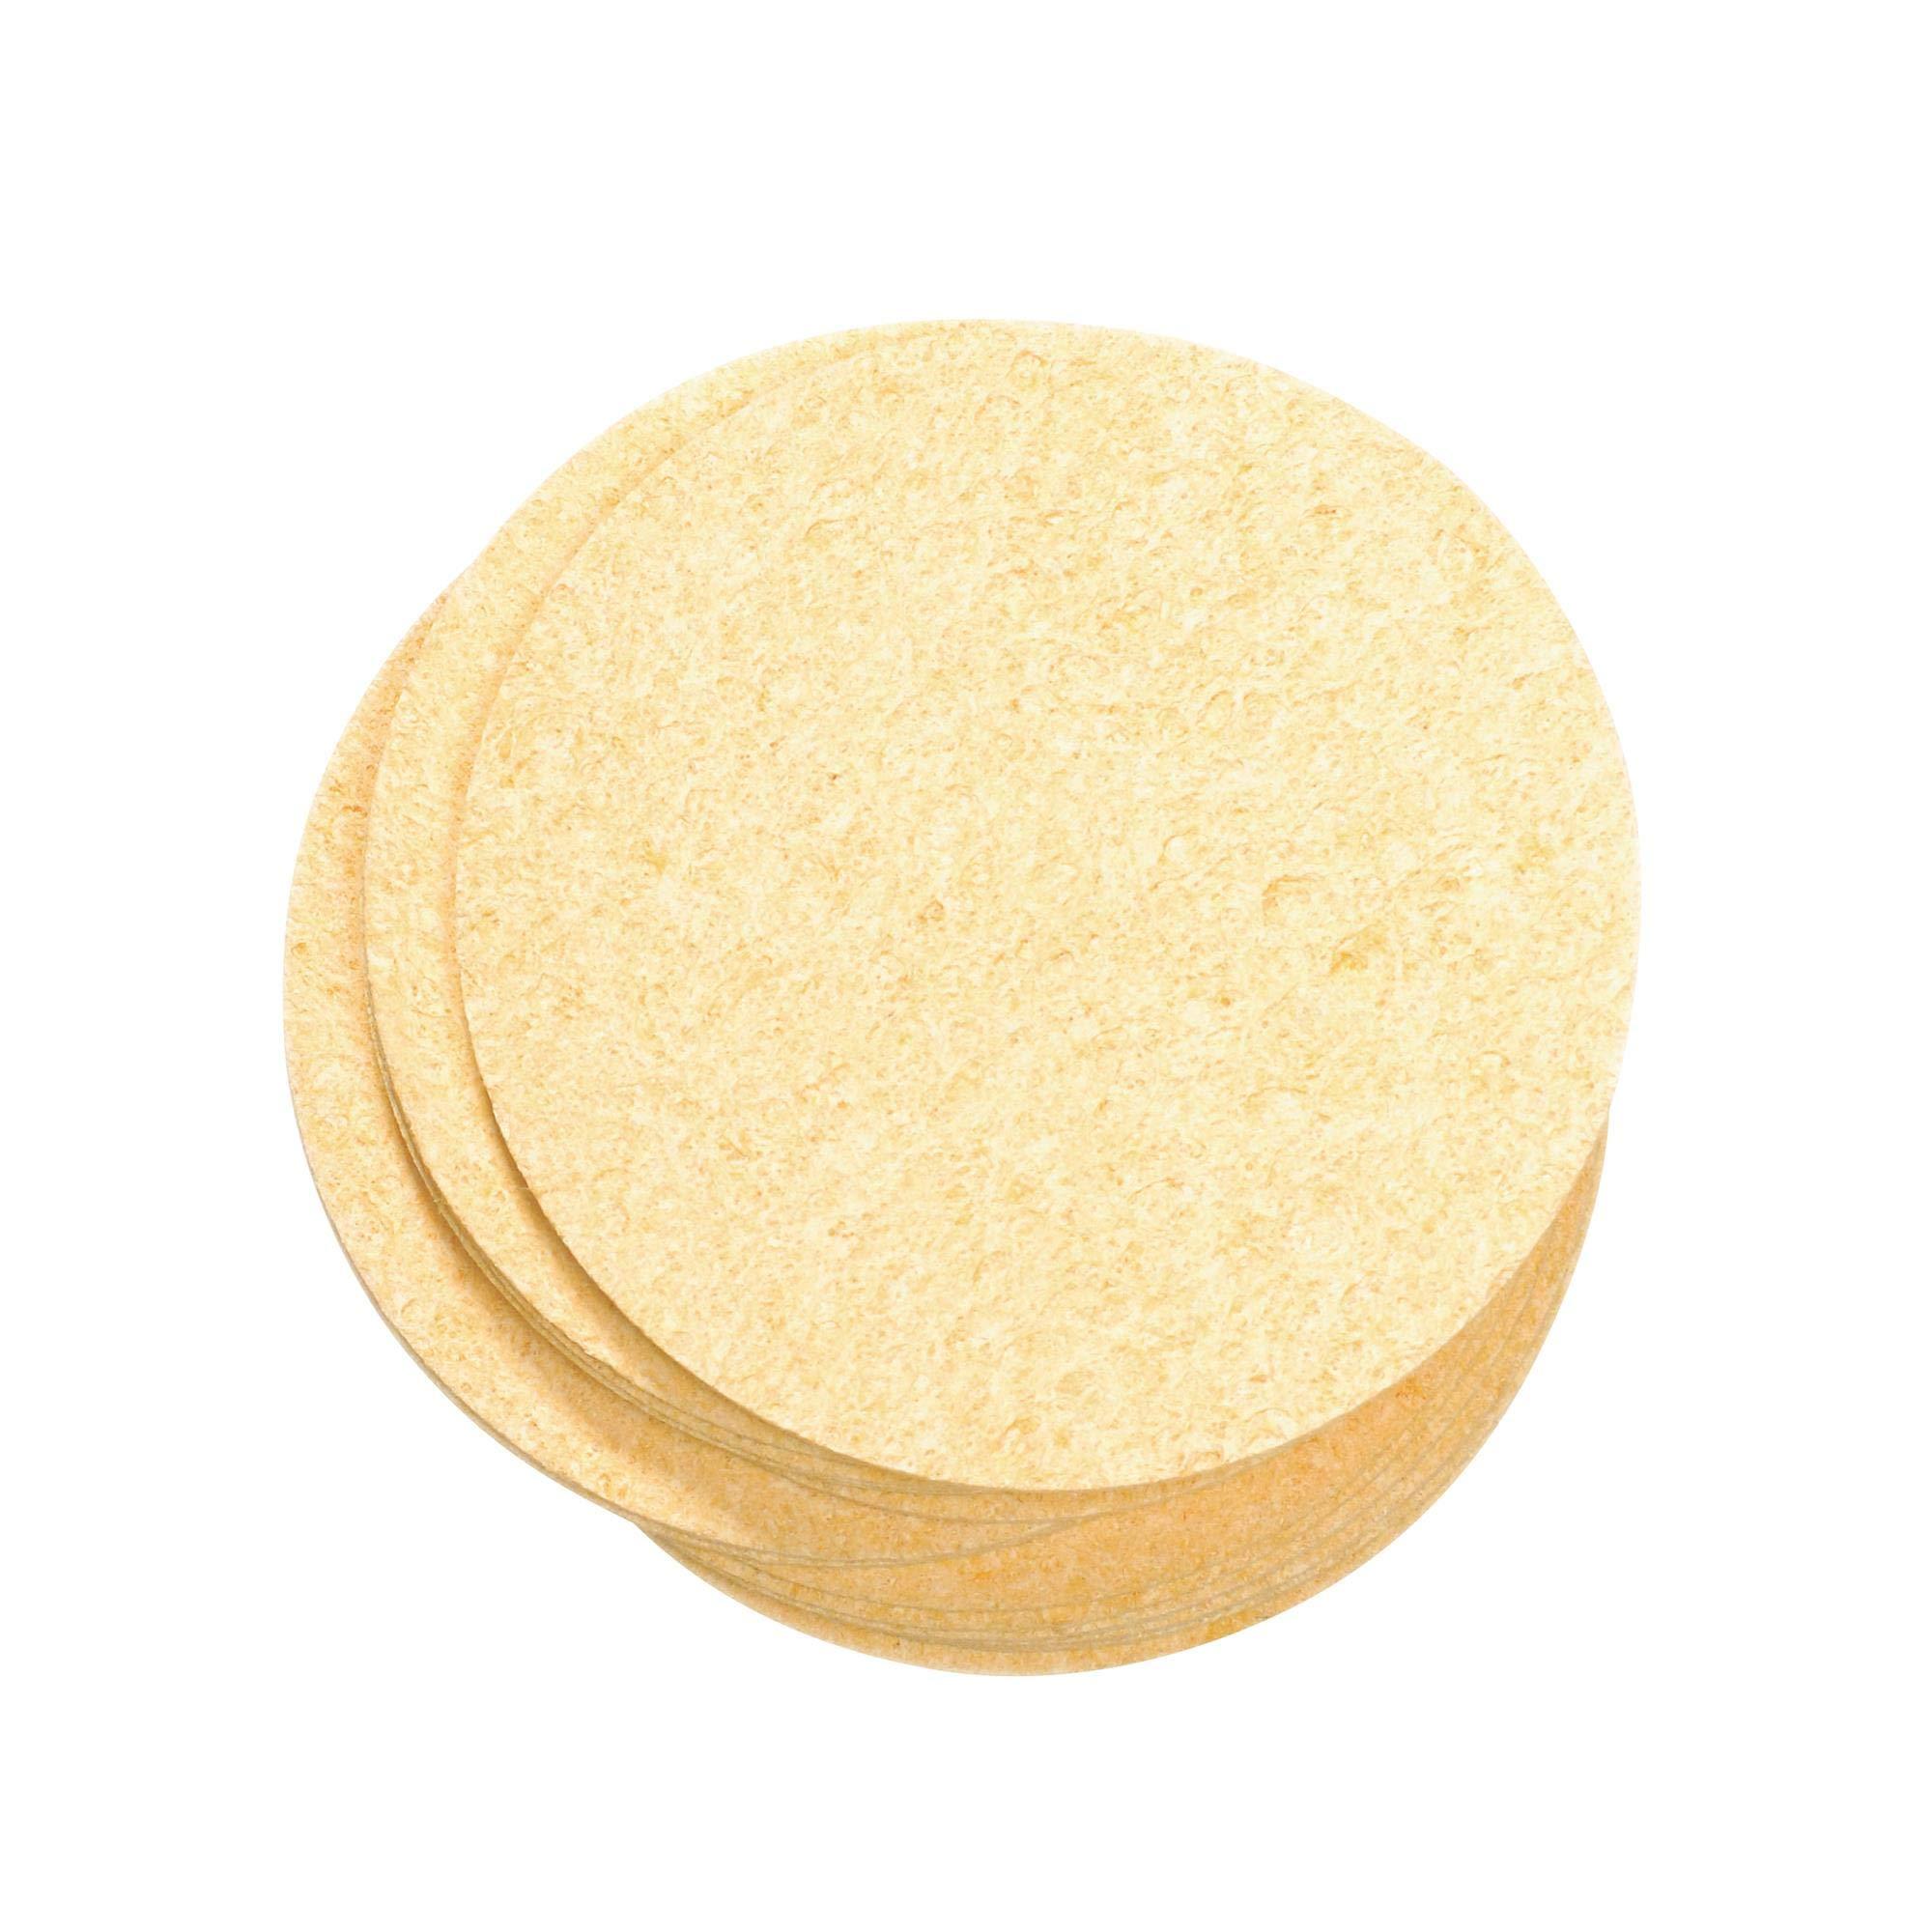 Prosana Compressed Sponges Natural 75 Pc.